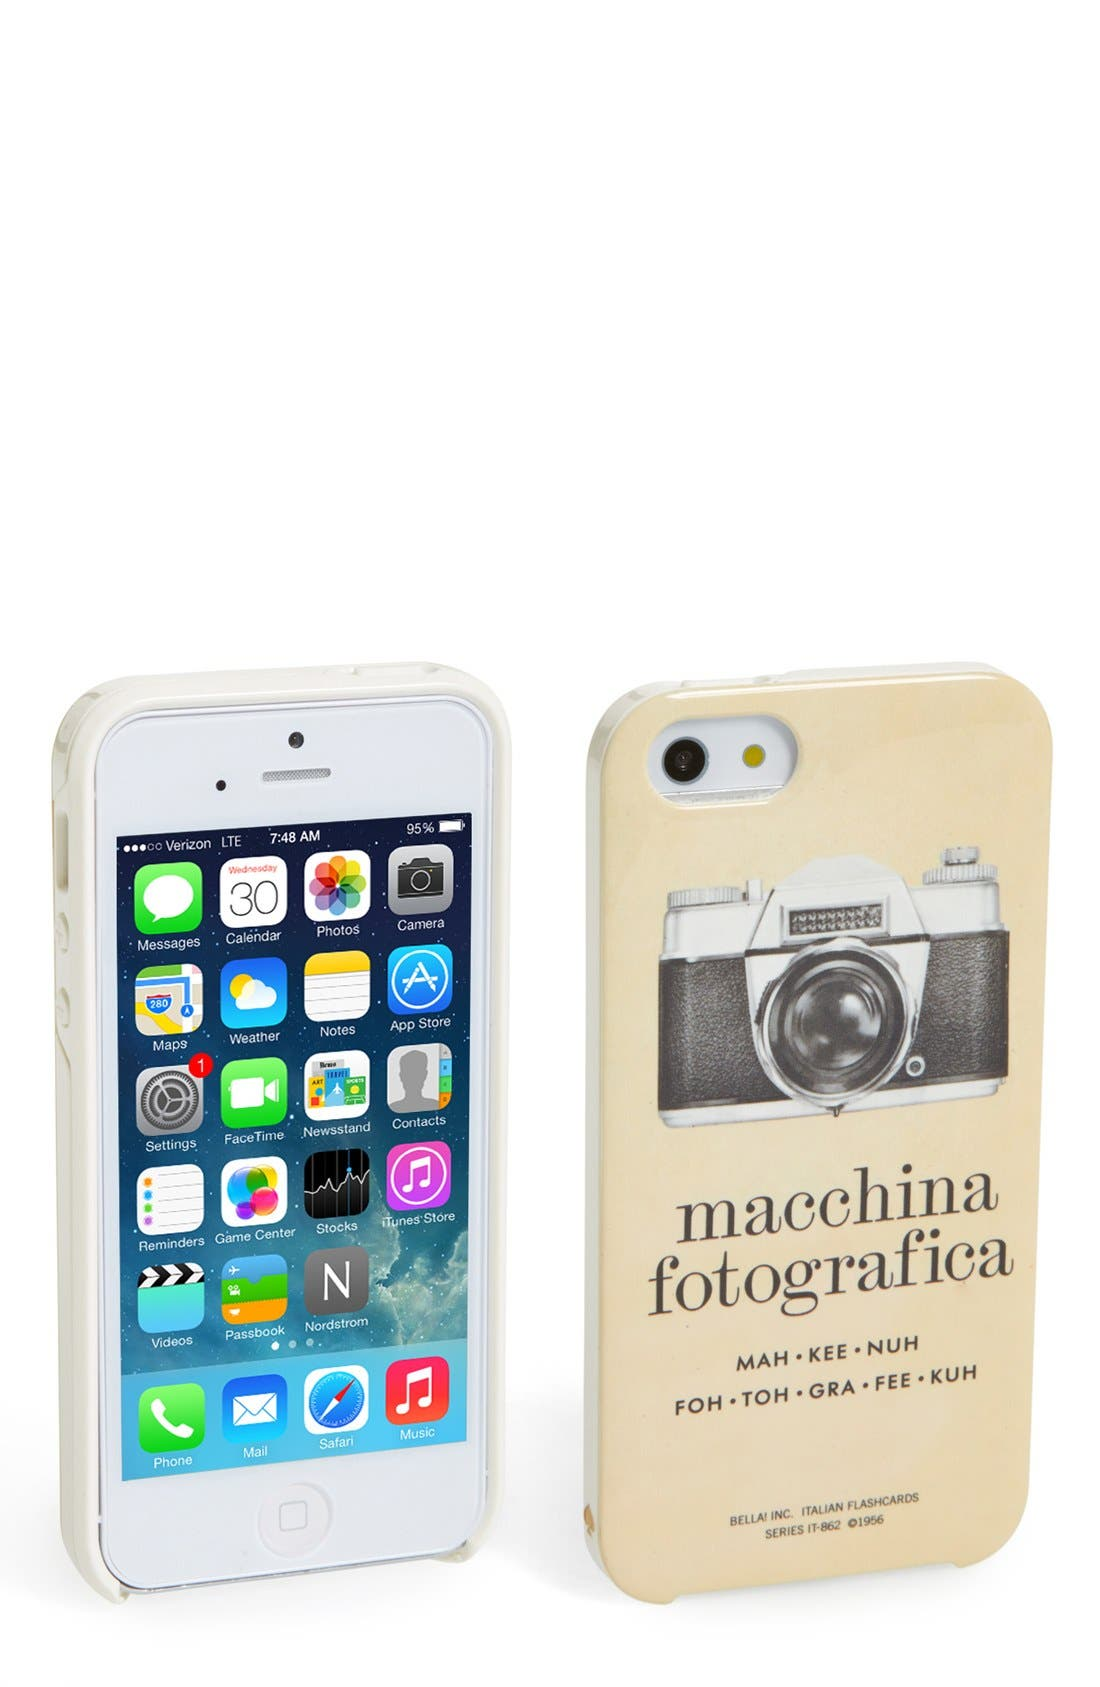 Main Image - kate spade new york 'italian flashcards' iPhone 5 & 5s case